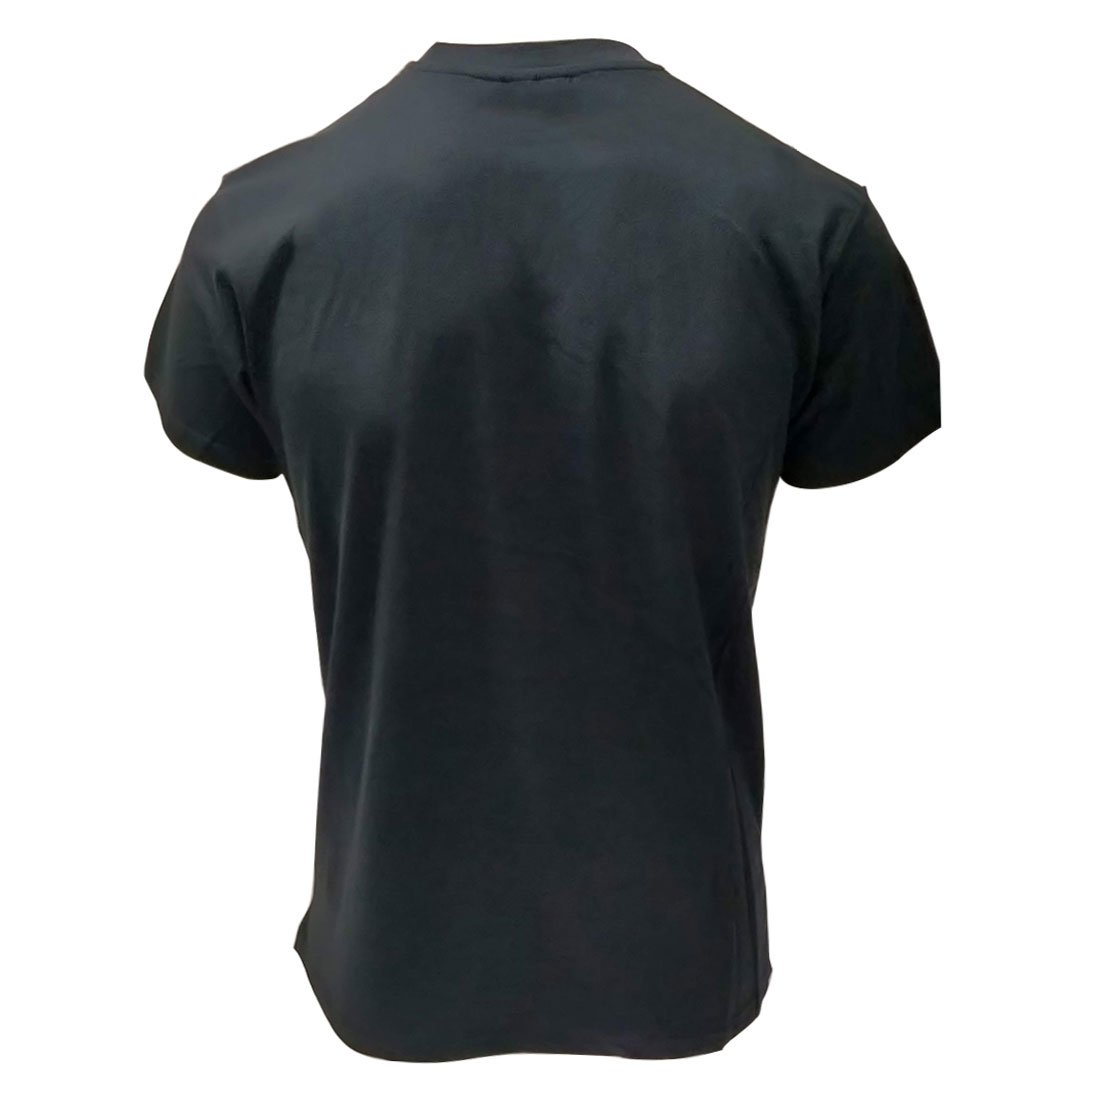 T-shirt Color Navy con Stampa Ireland Celts - Viaggiare in Irlanda